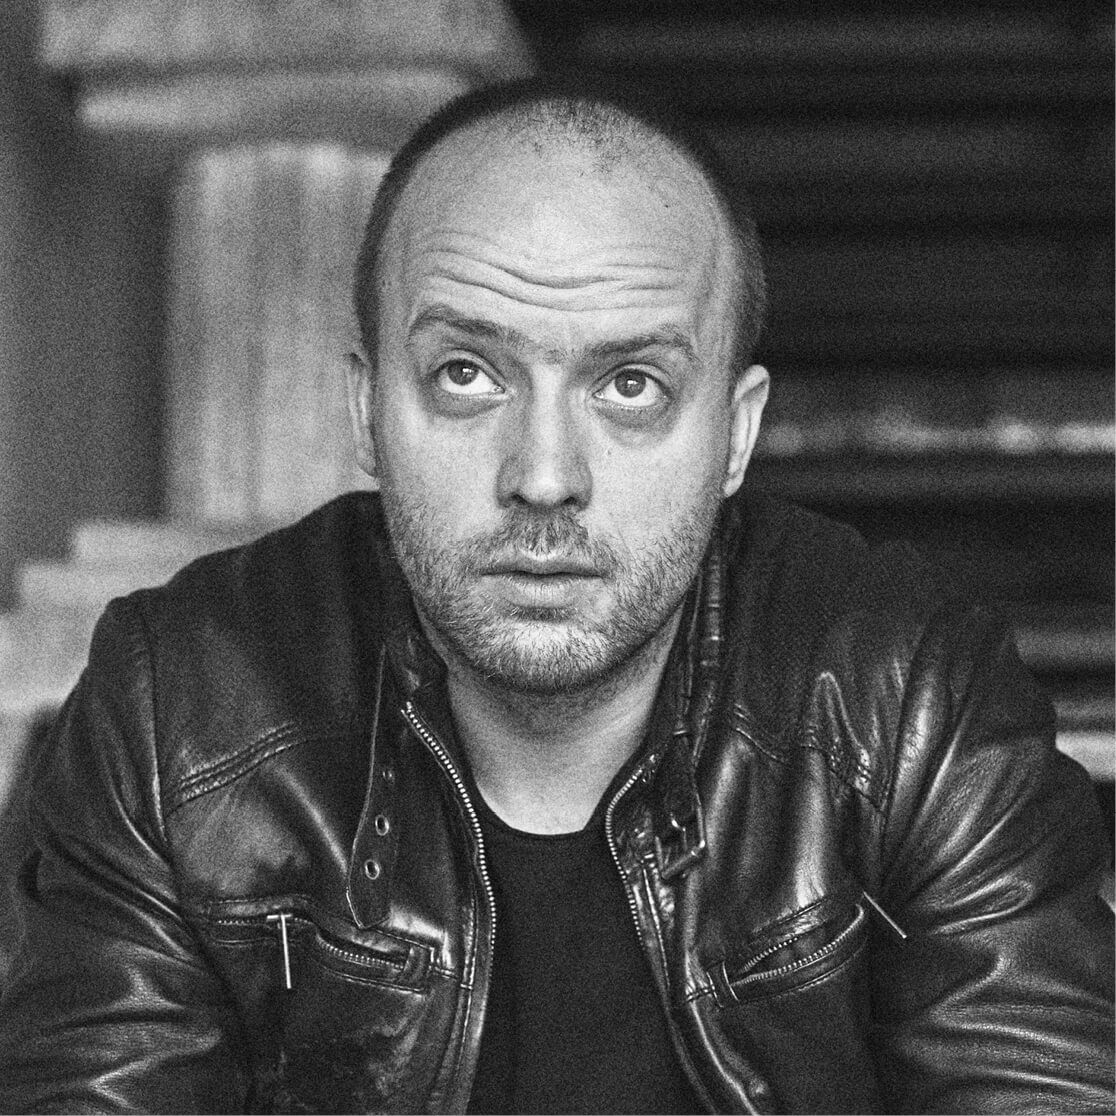 Marek Braun